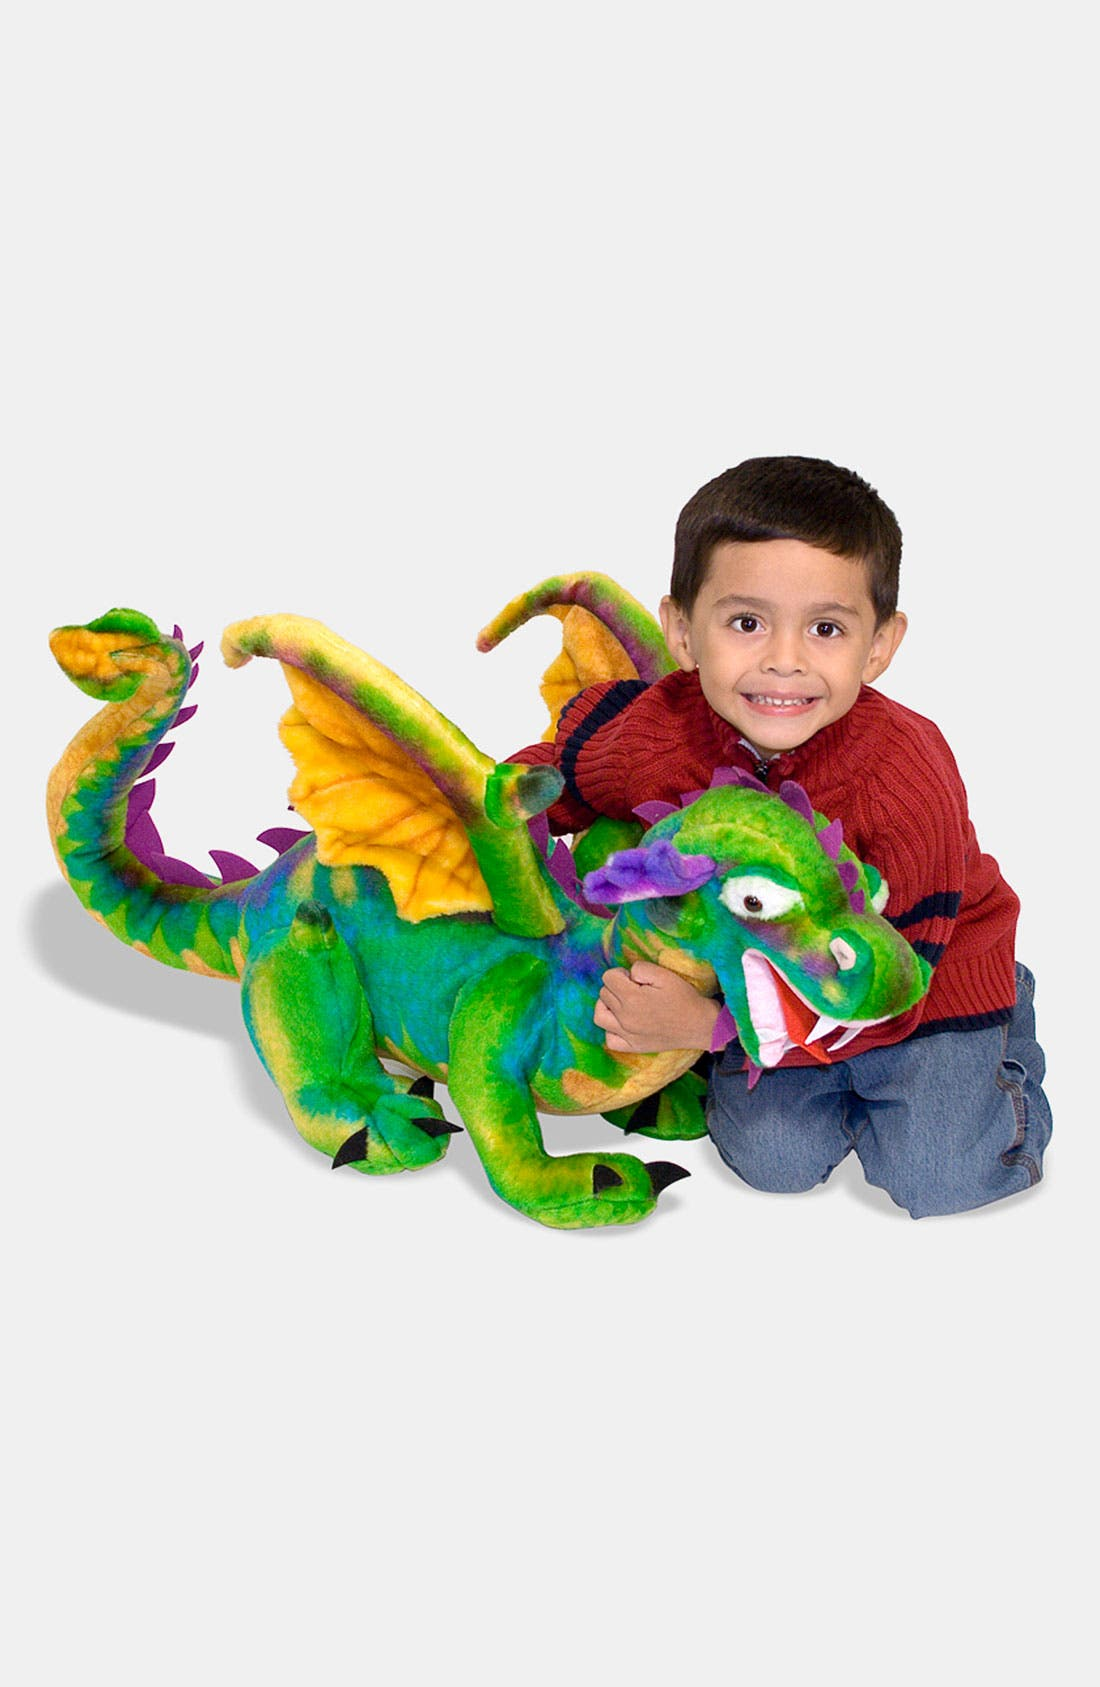 Melissa & Doug Oversized Plush Stuffed Dragon